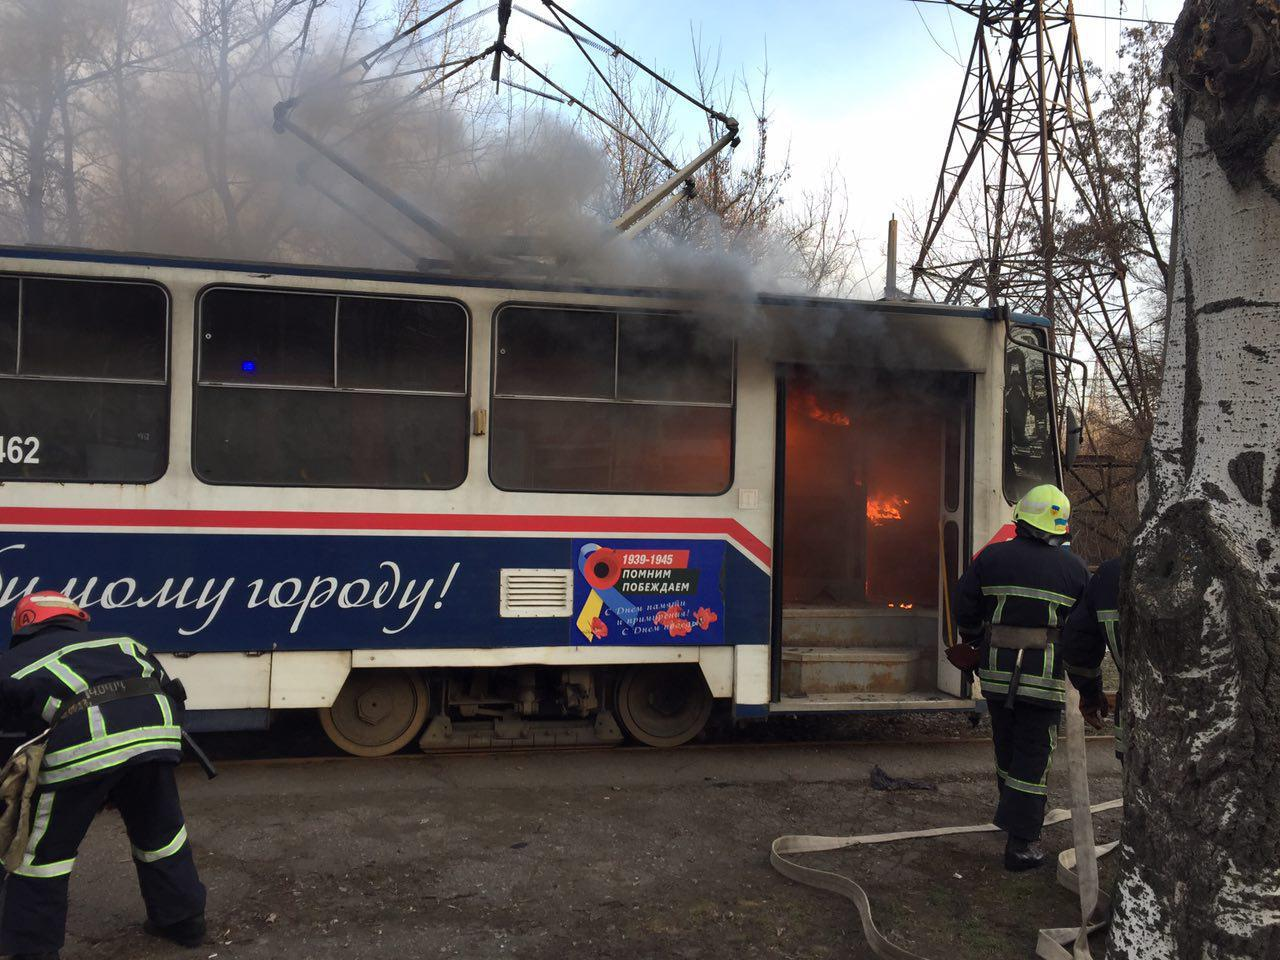 Спасатели озвучили причину ЧП в трамвае и опубликовали фото